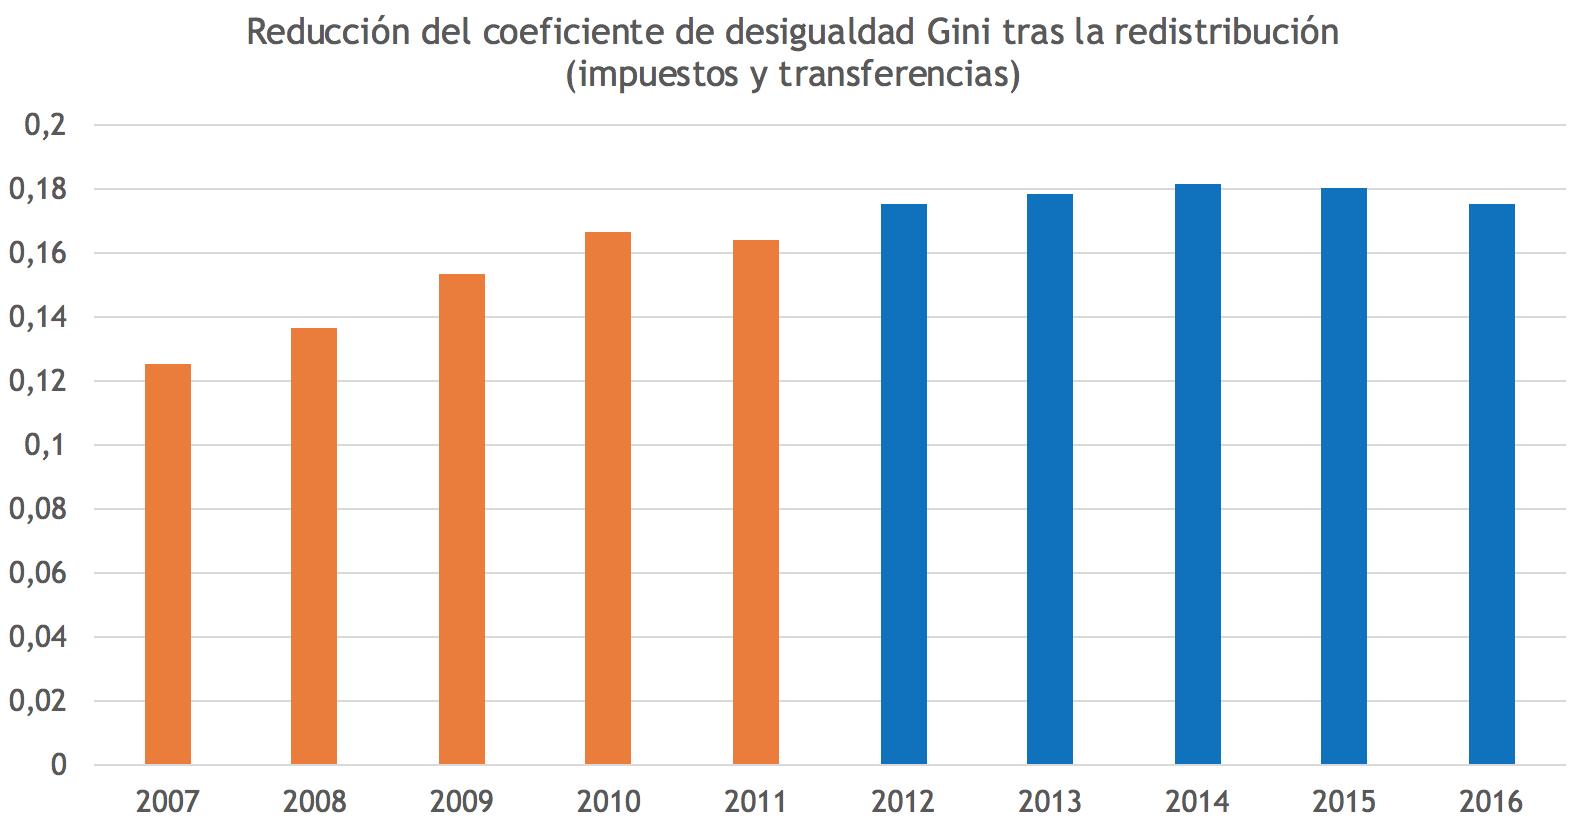 redistribucion-renta-rajoy-zapatero-pp-p